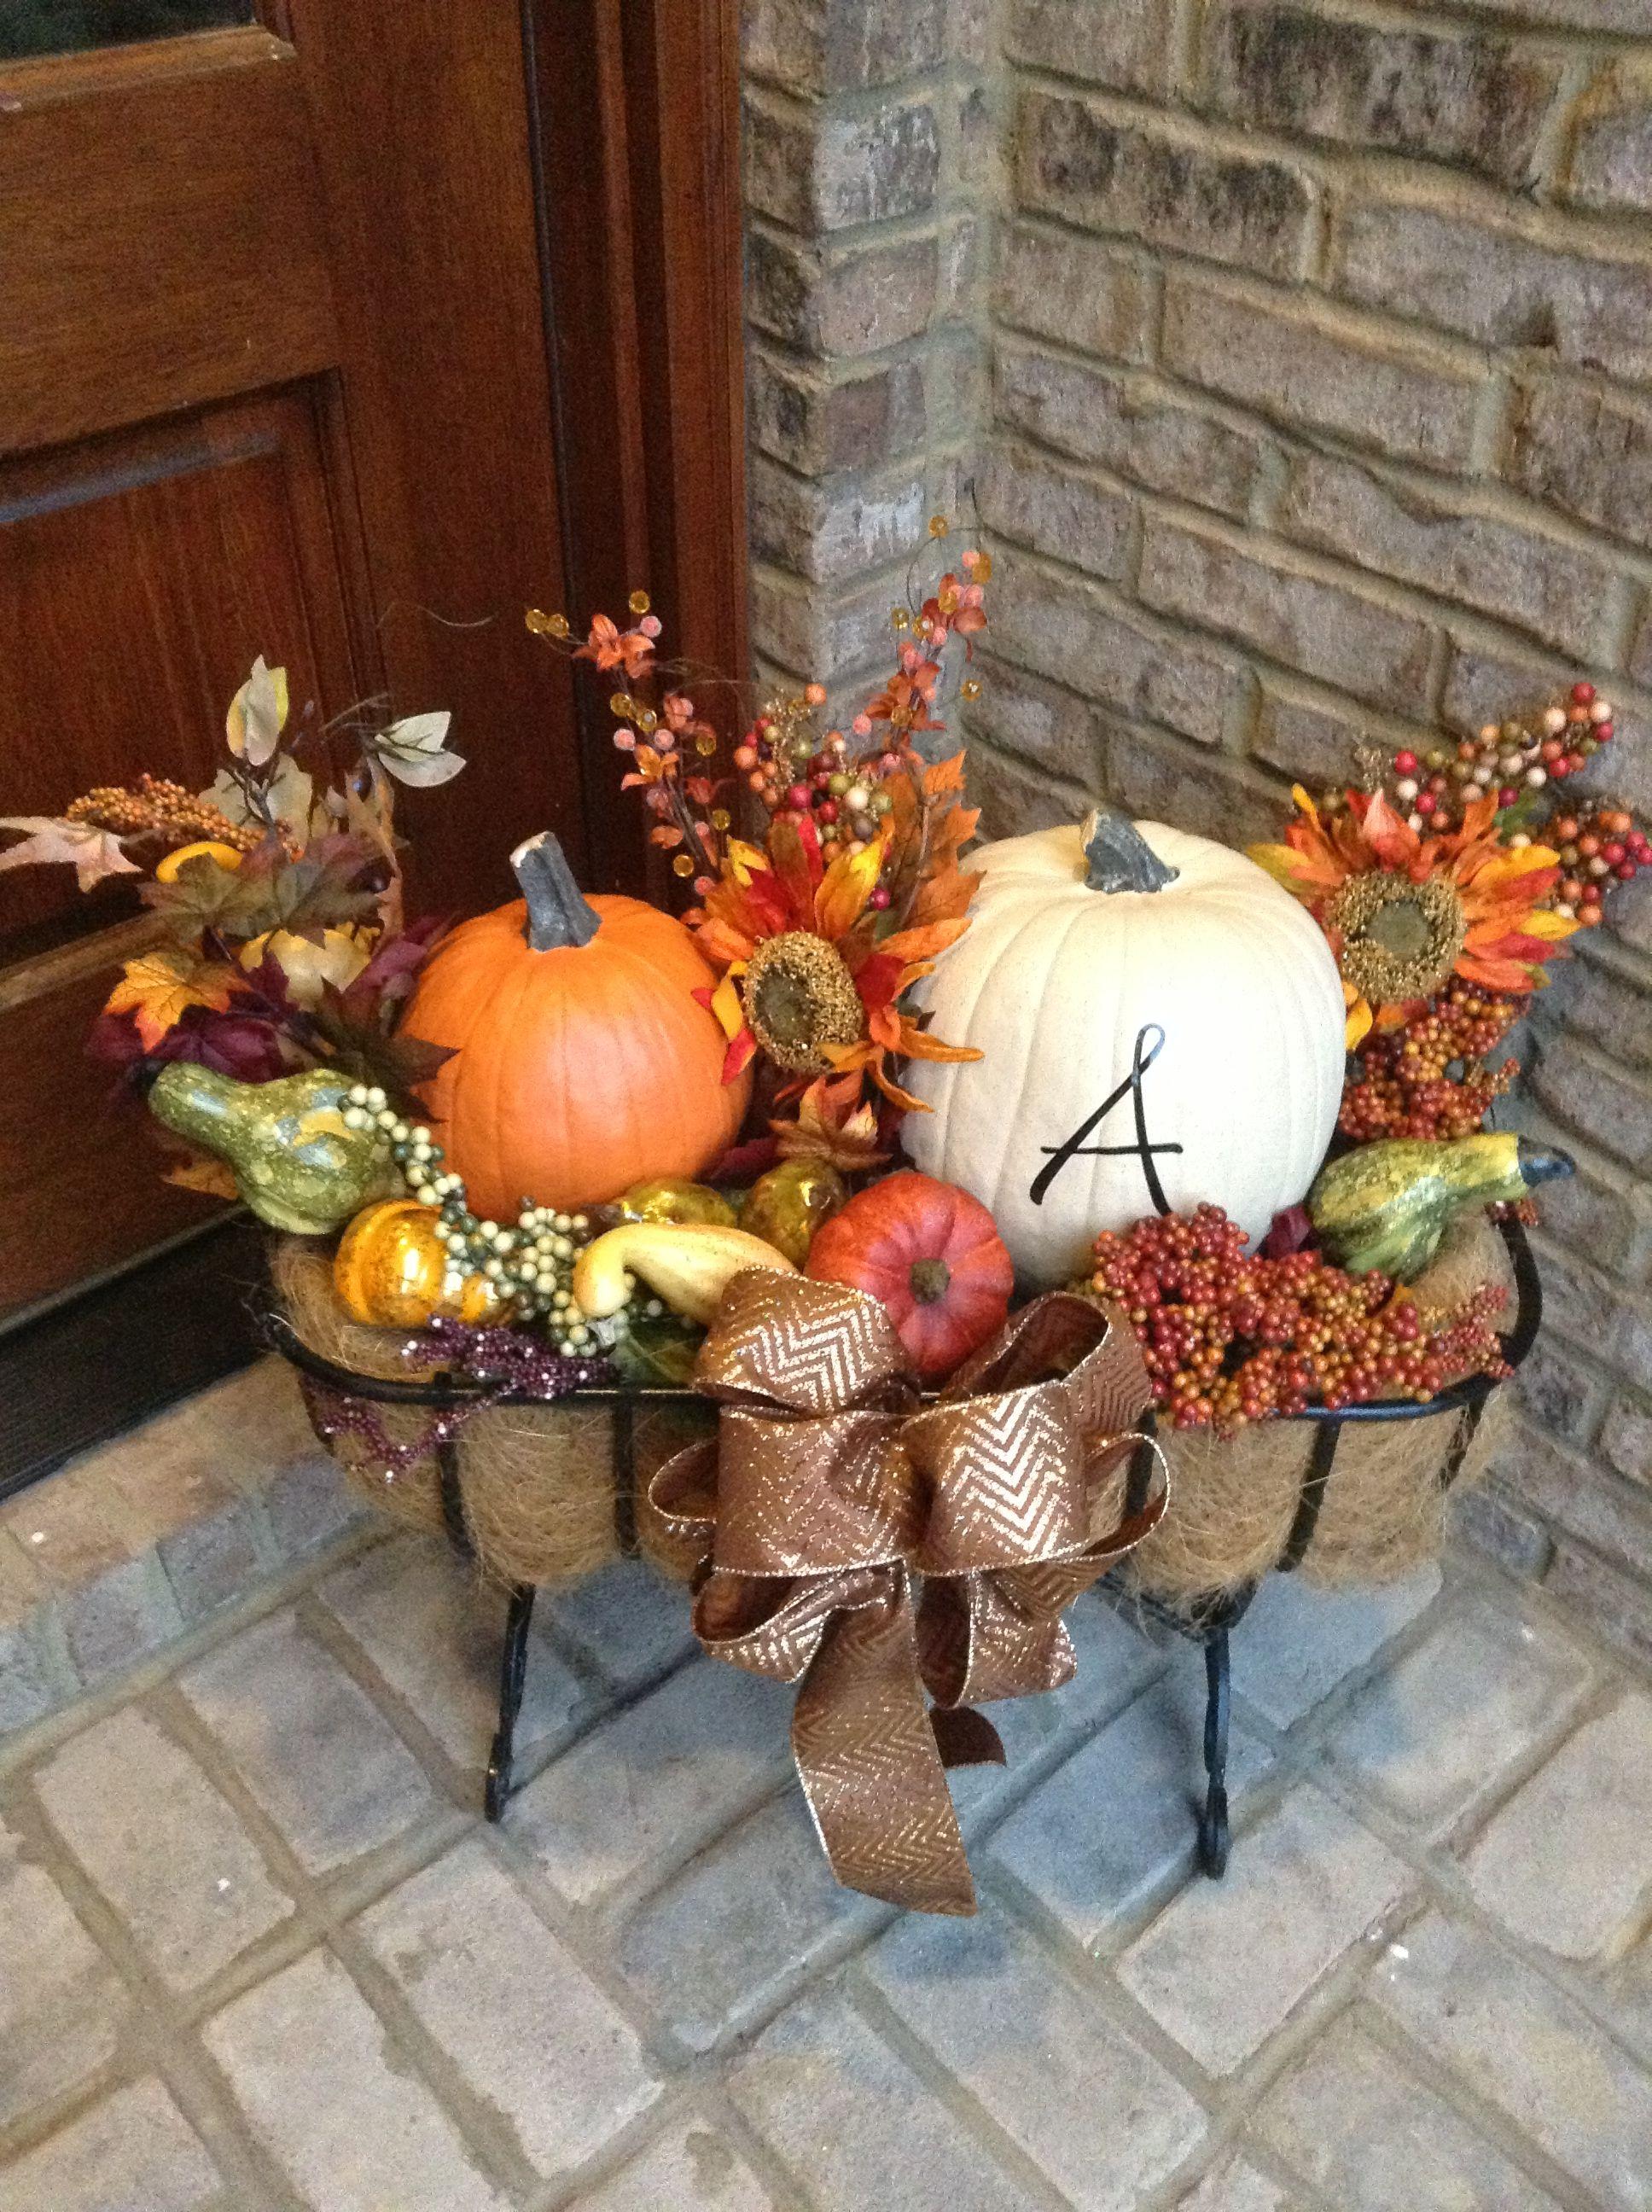 Fall Porch Pumpkin Basket Home Decor Outdoor